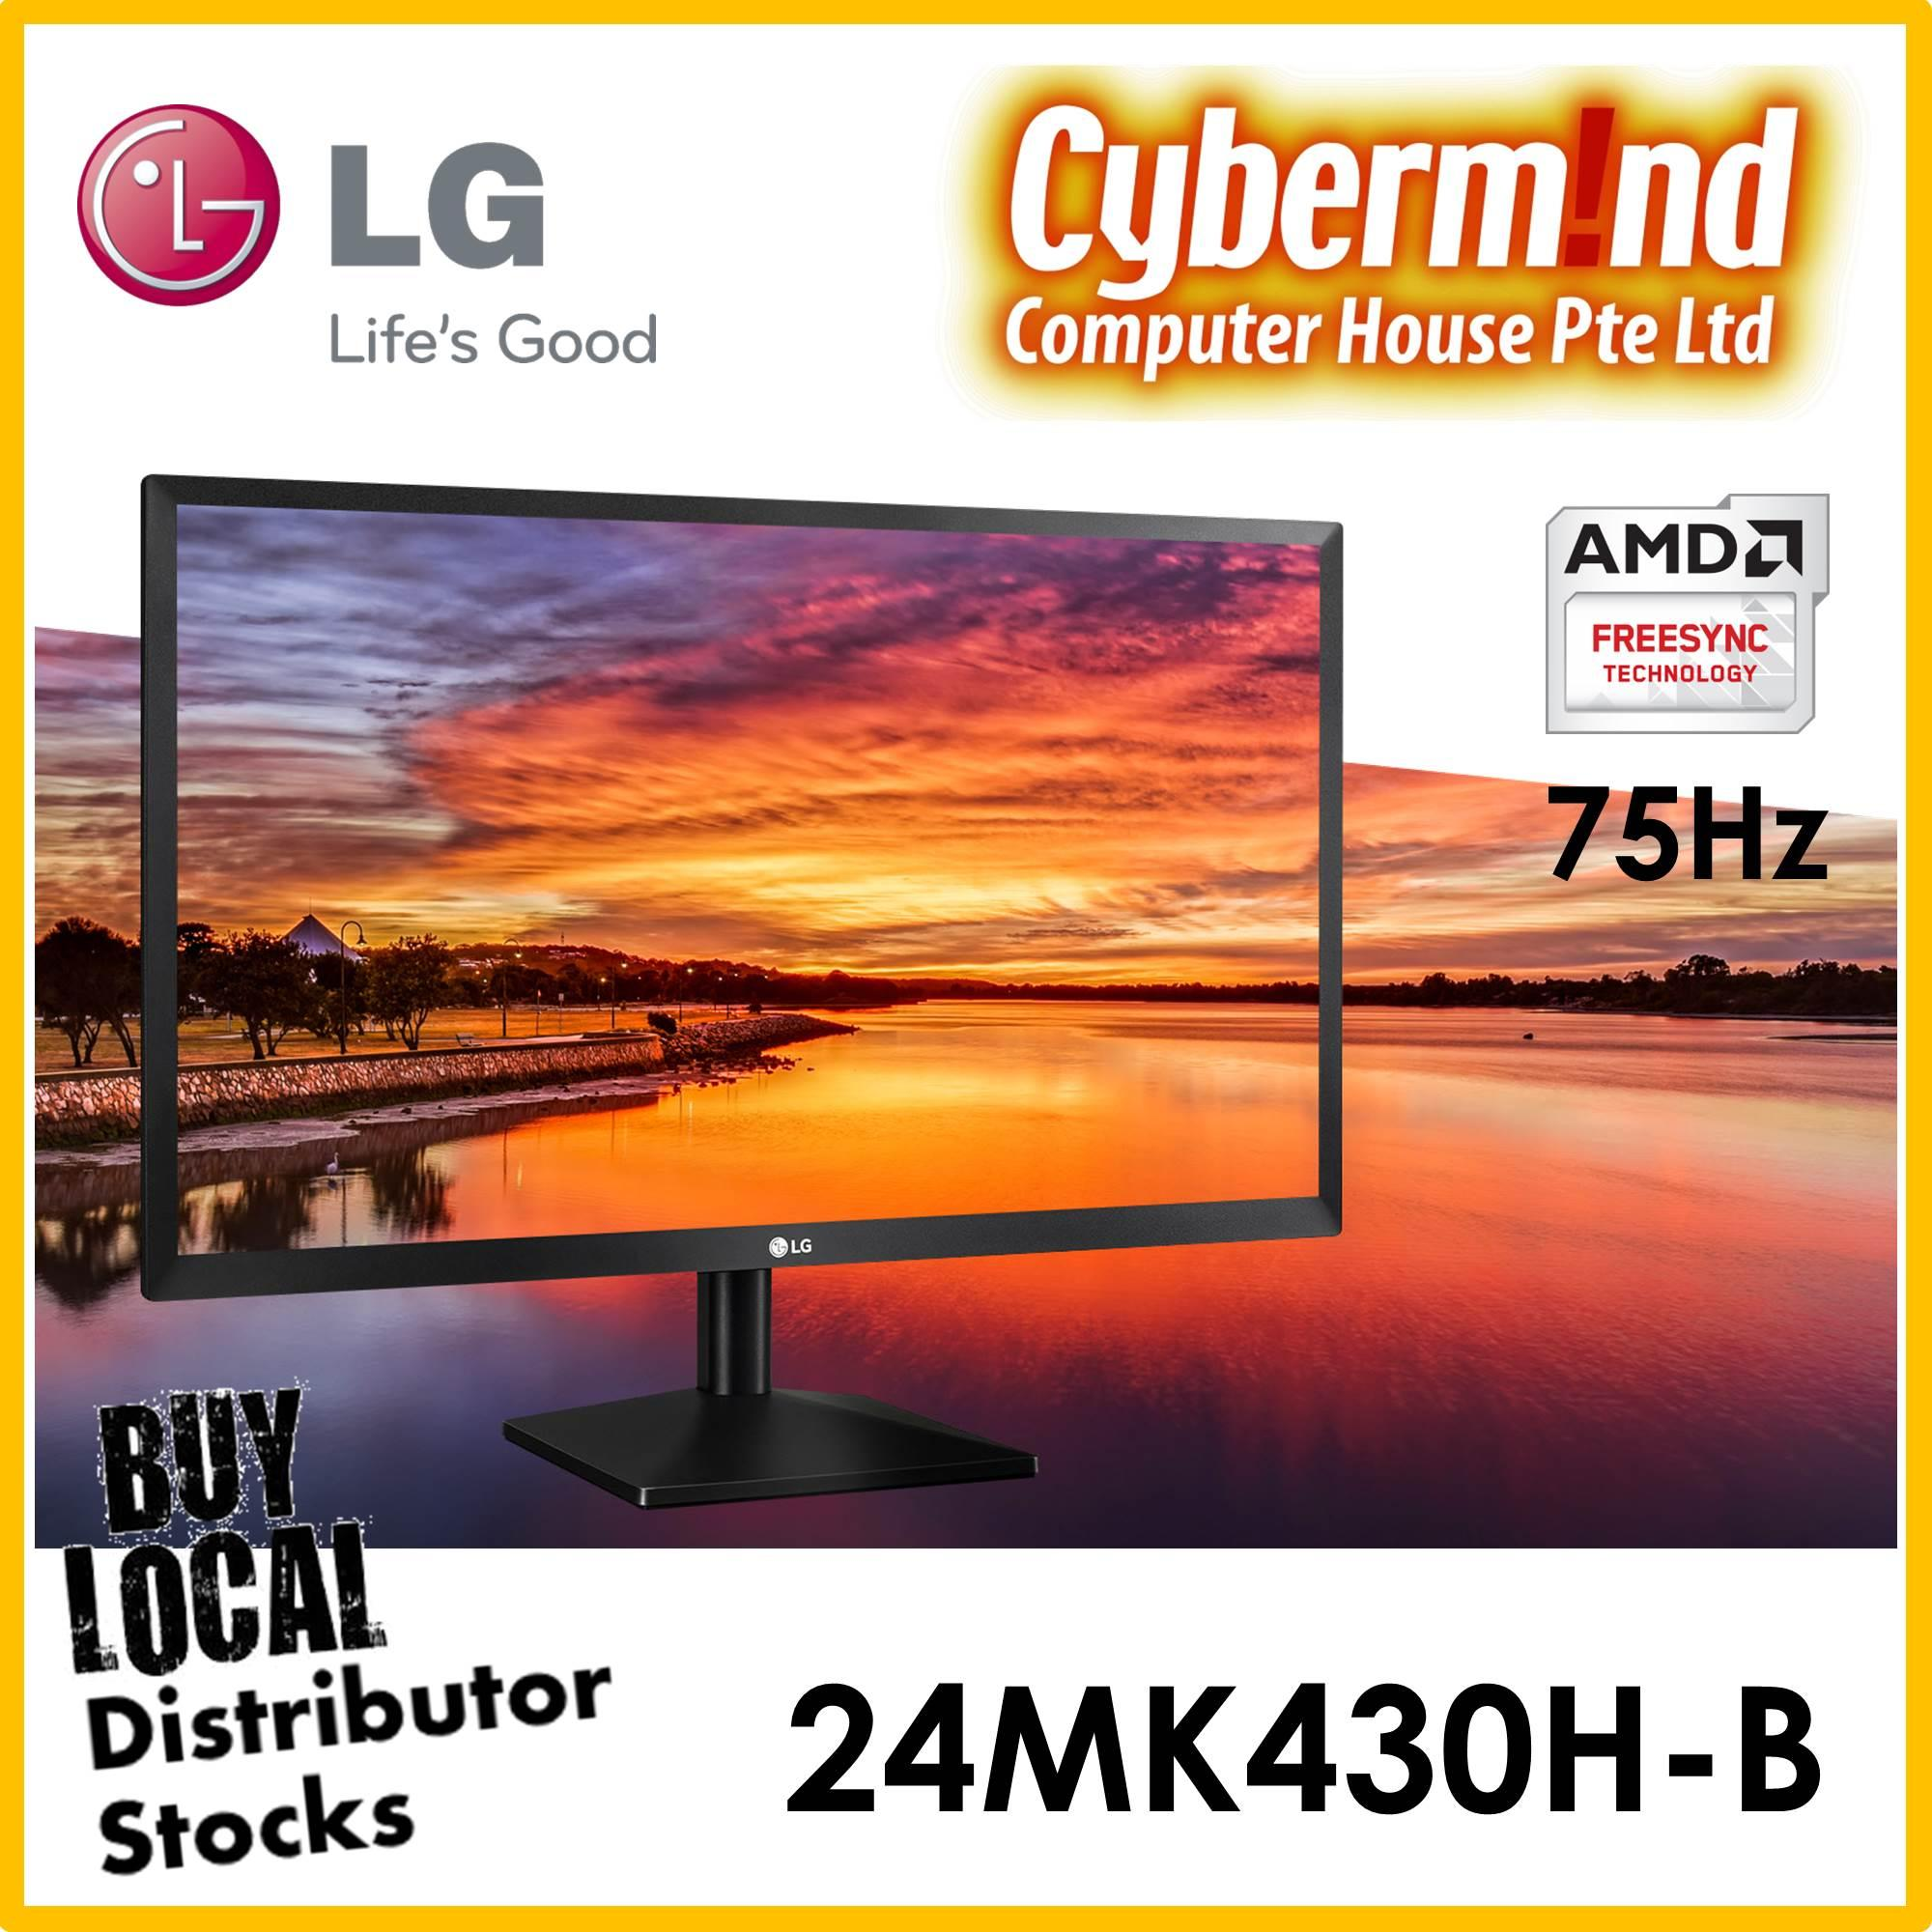 LG 24MK430H-B / 24MK430H 24 Class Full HD IPS LED Monitor with AMD FreeSync (23.8 Diagonal)